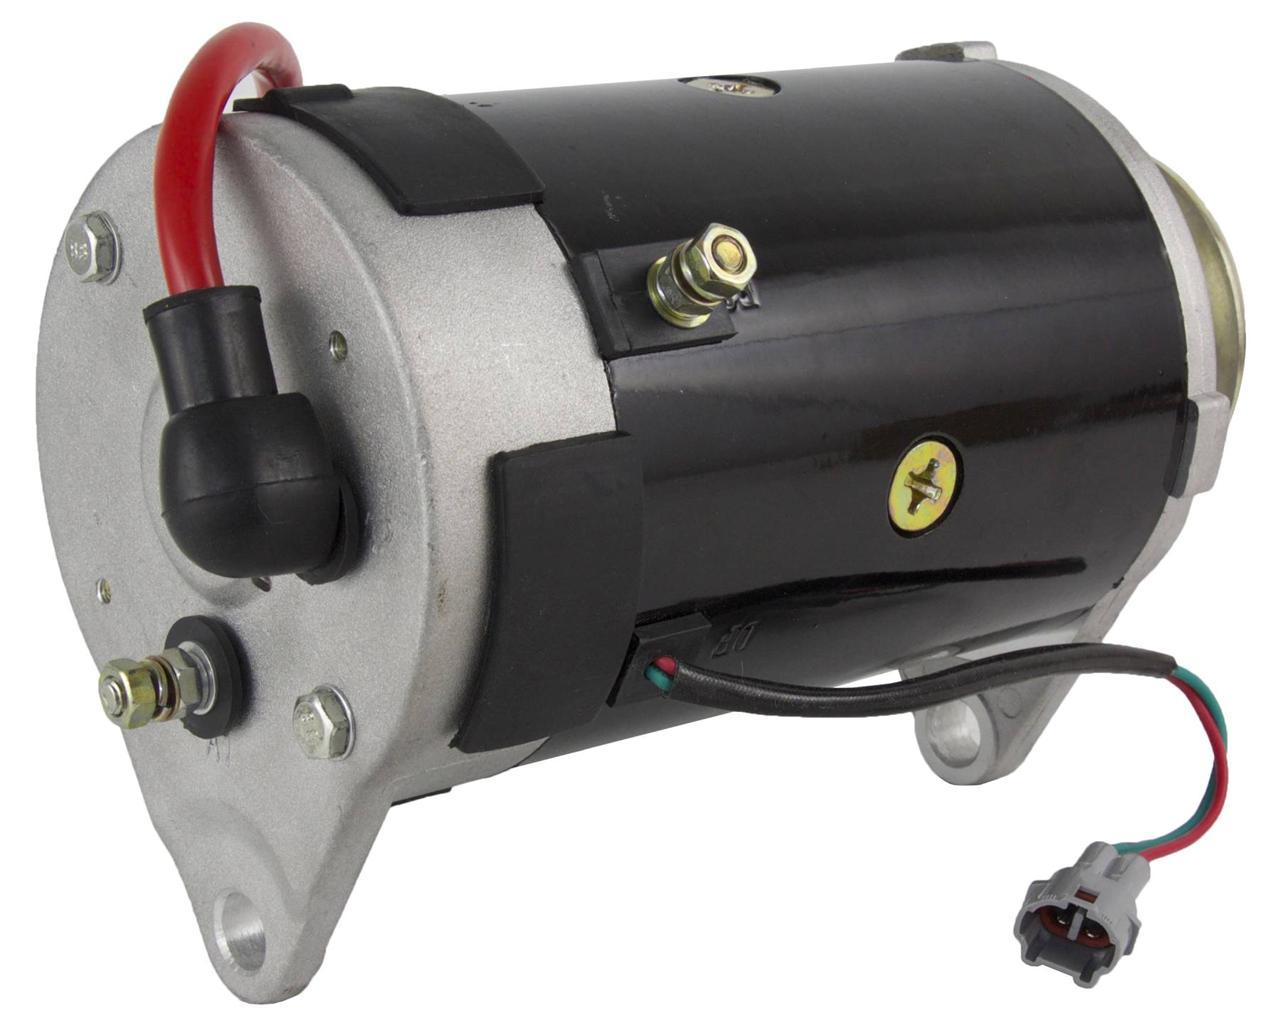 hight resolution of hitachi starter wiring 5 19 sg dbd de u2022starter generator yamaha golf cart g16 g22